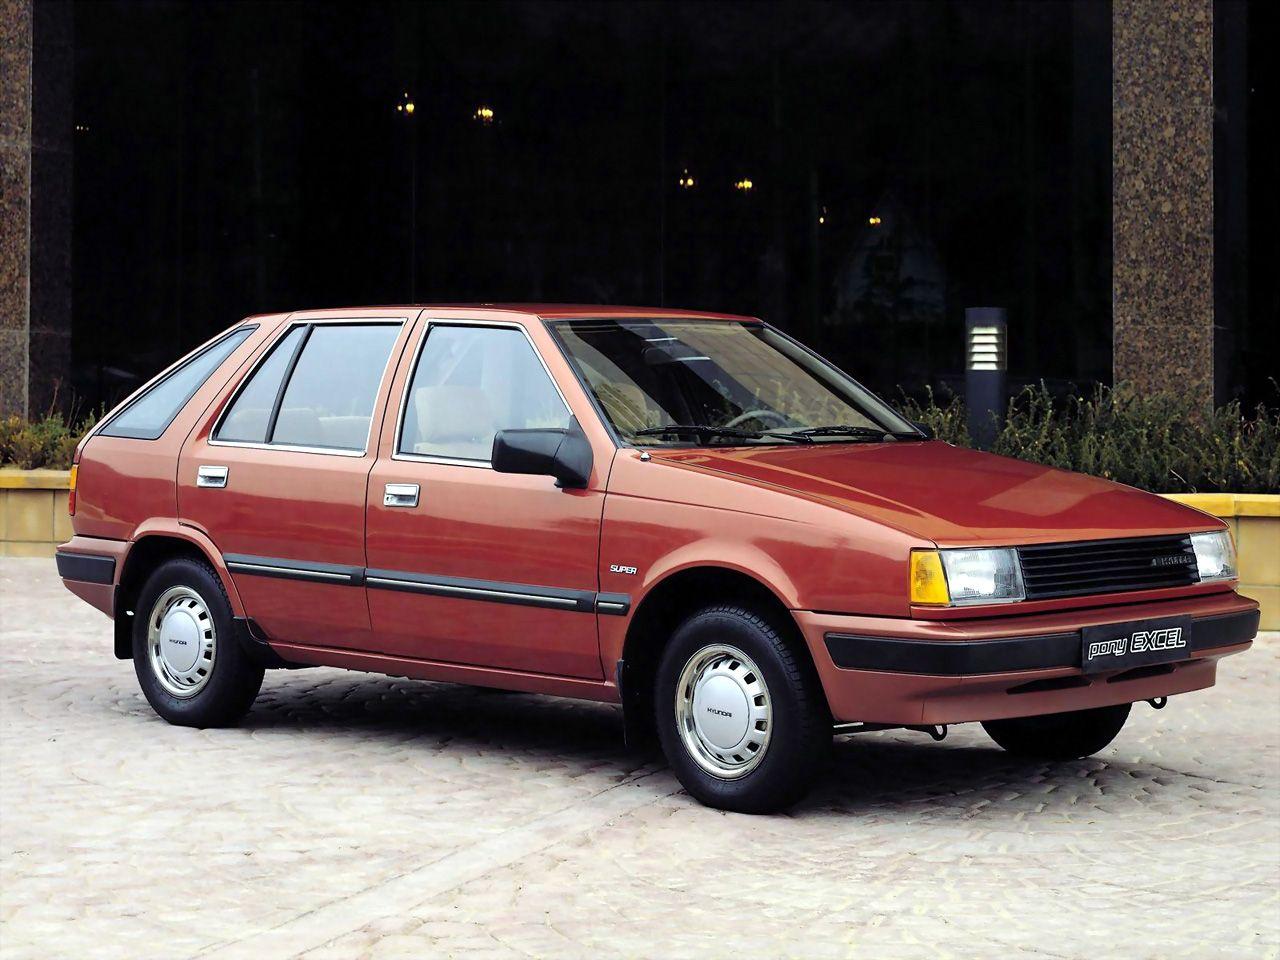 1985 1989 Hyundai Pony Excel Super Classic Cars Hyundai Hyundai Cars